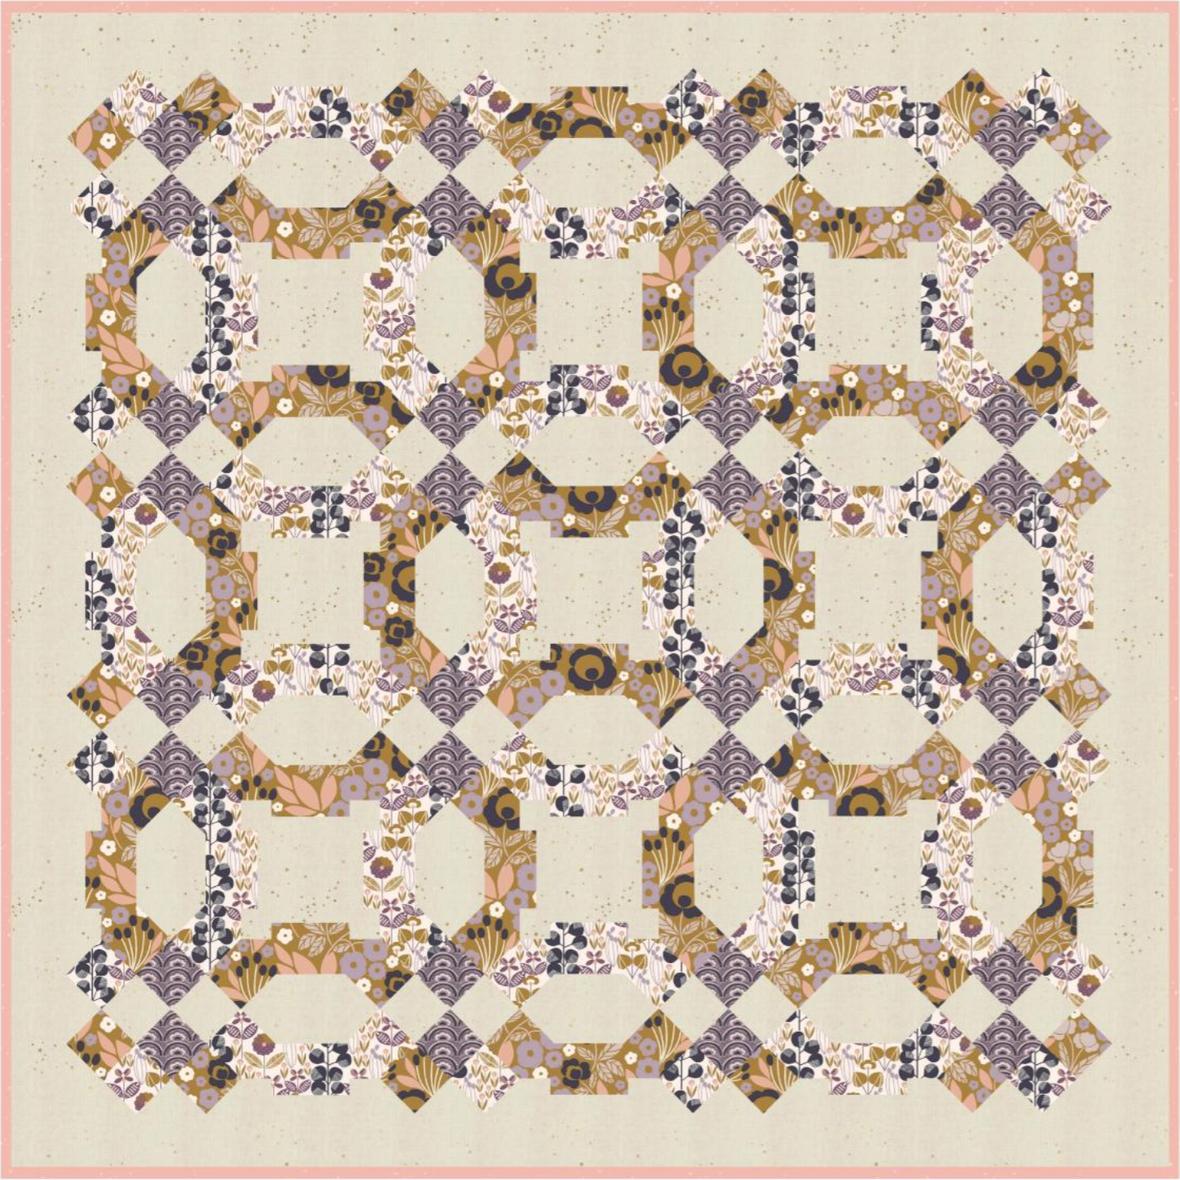 pen and paper patterns vegas wedding